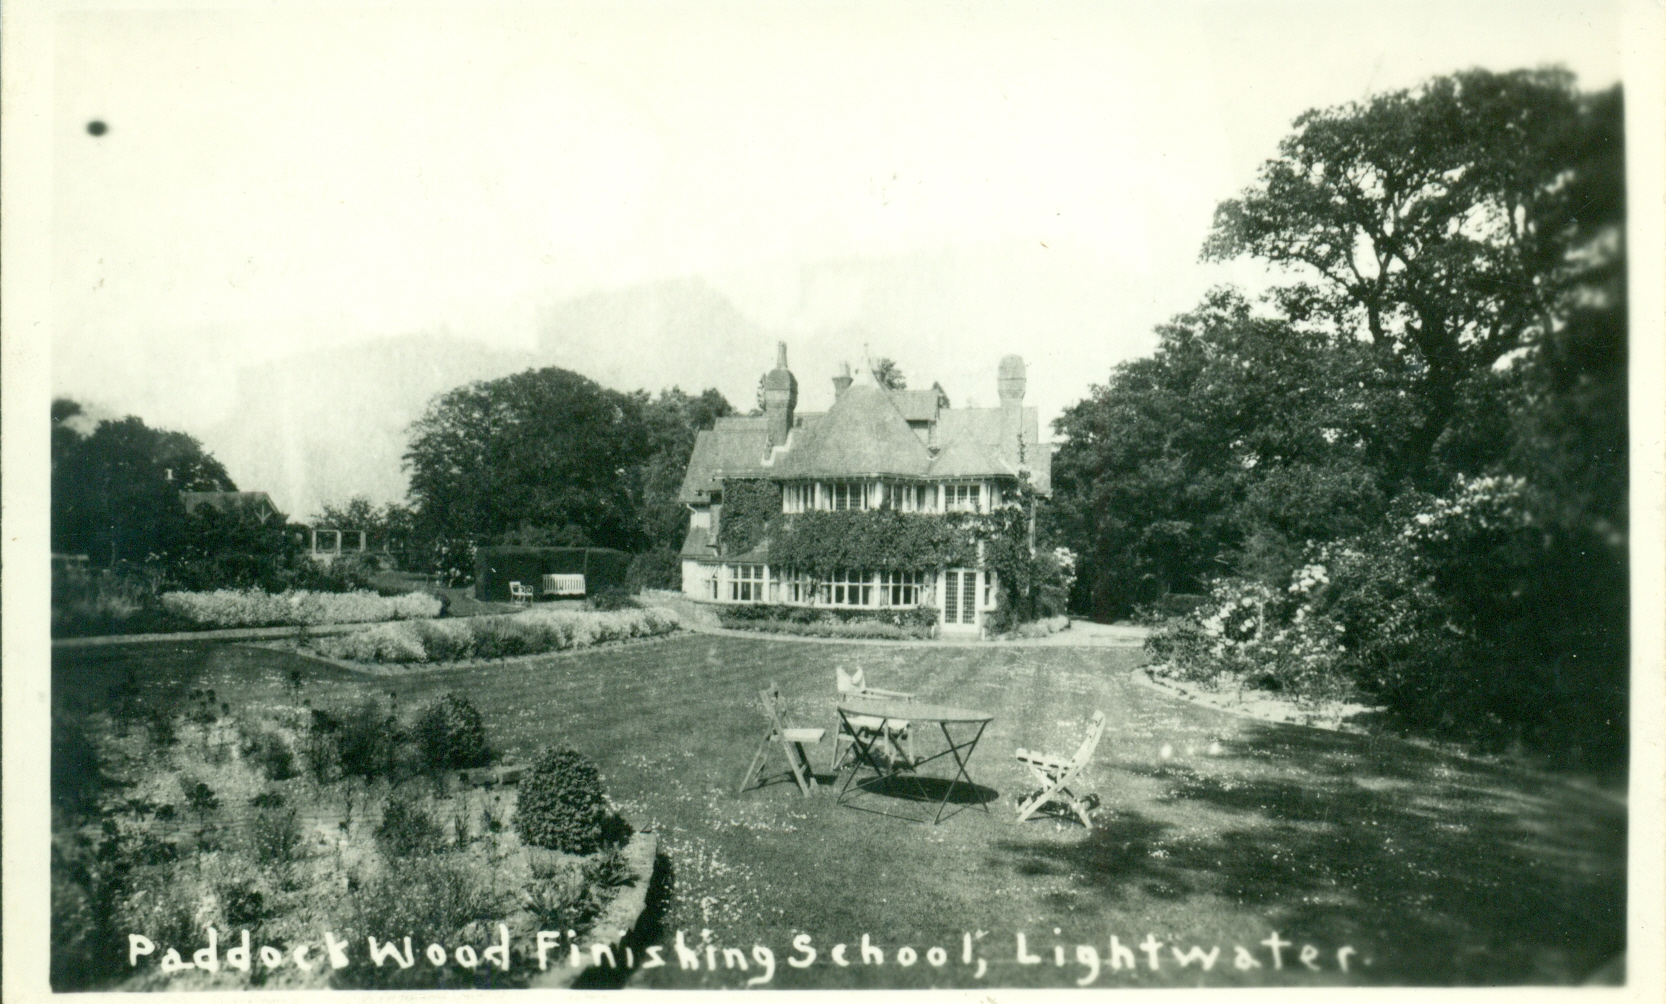 Paddock Wood Finishing School, Lightwater